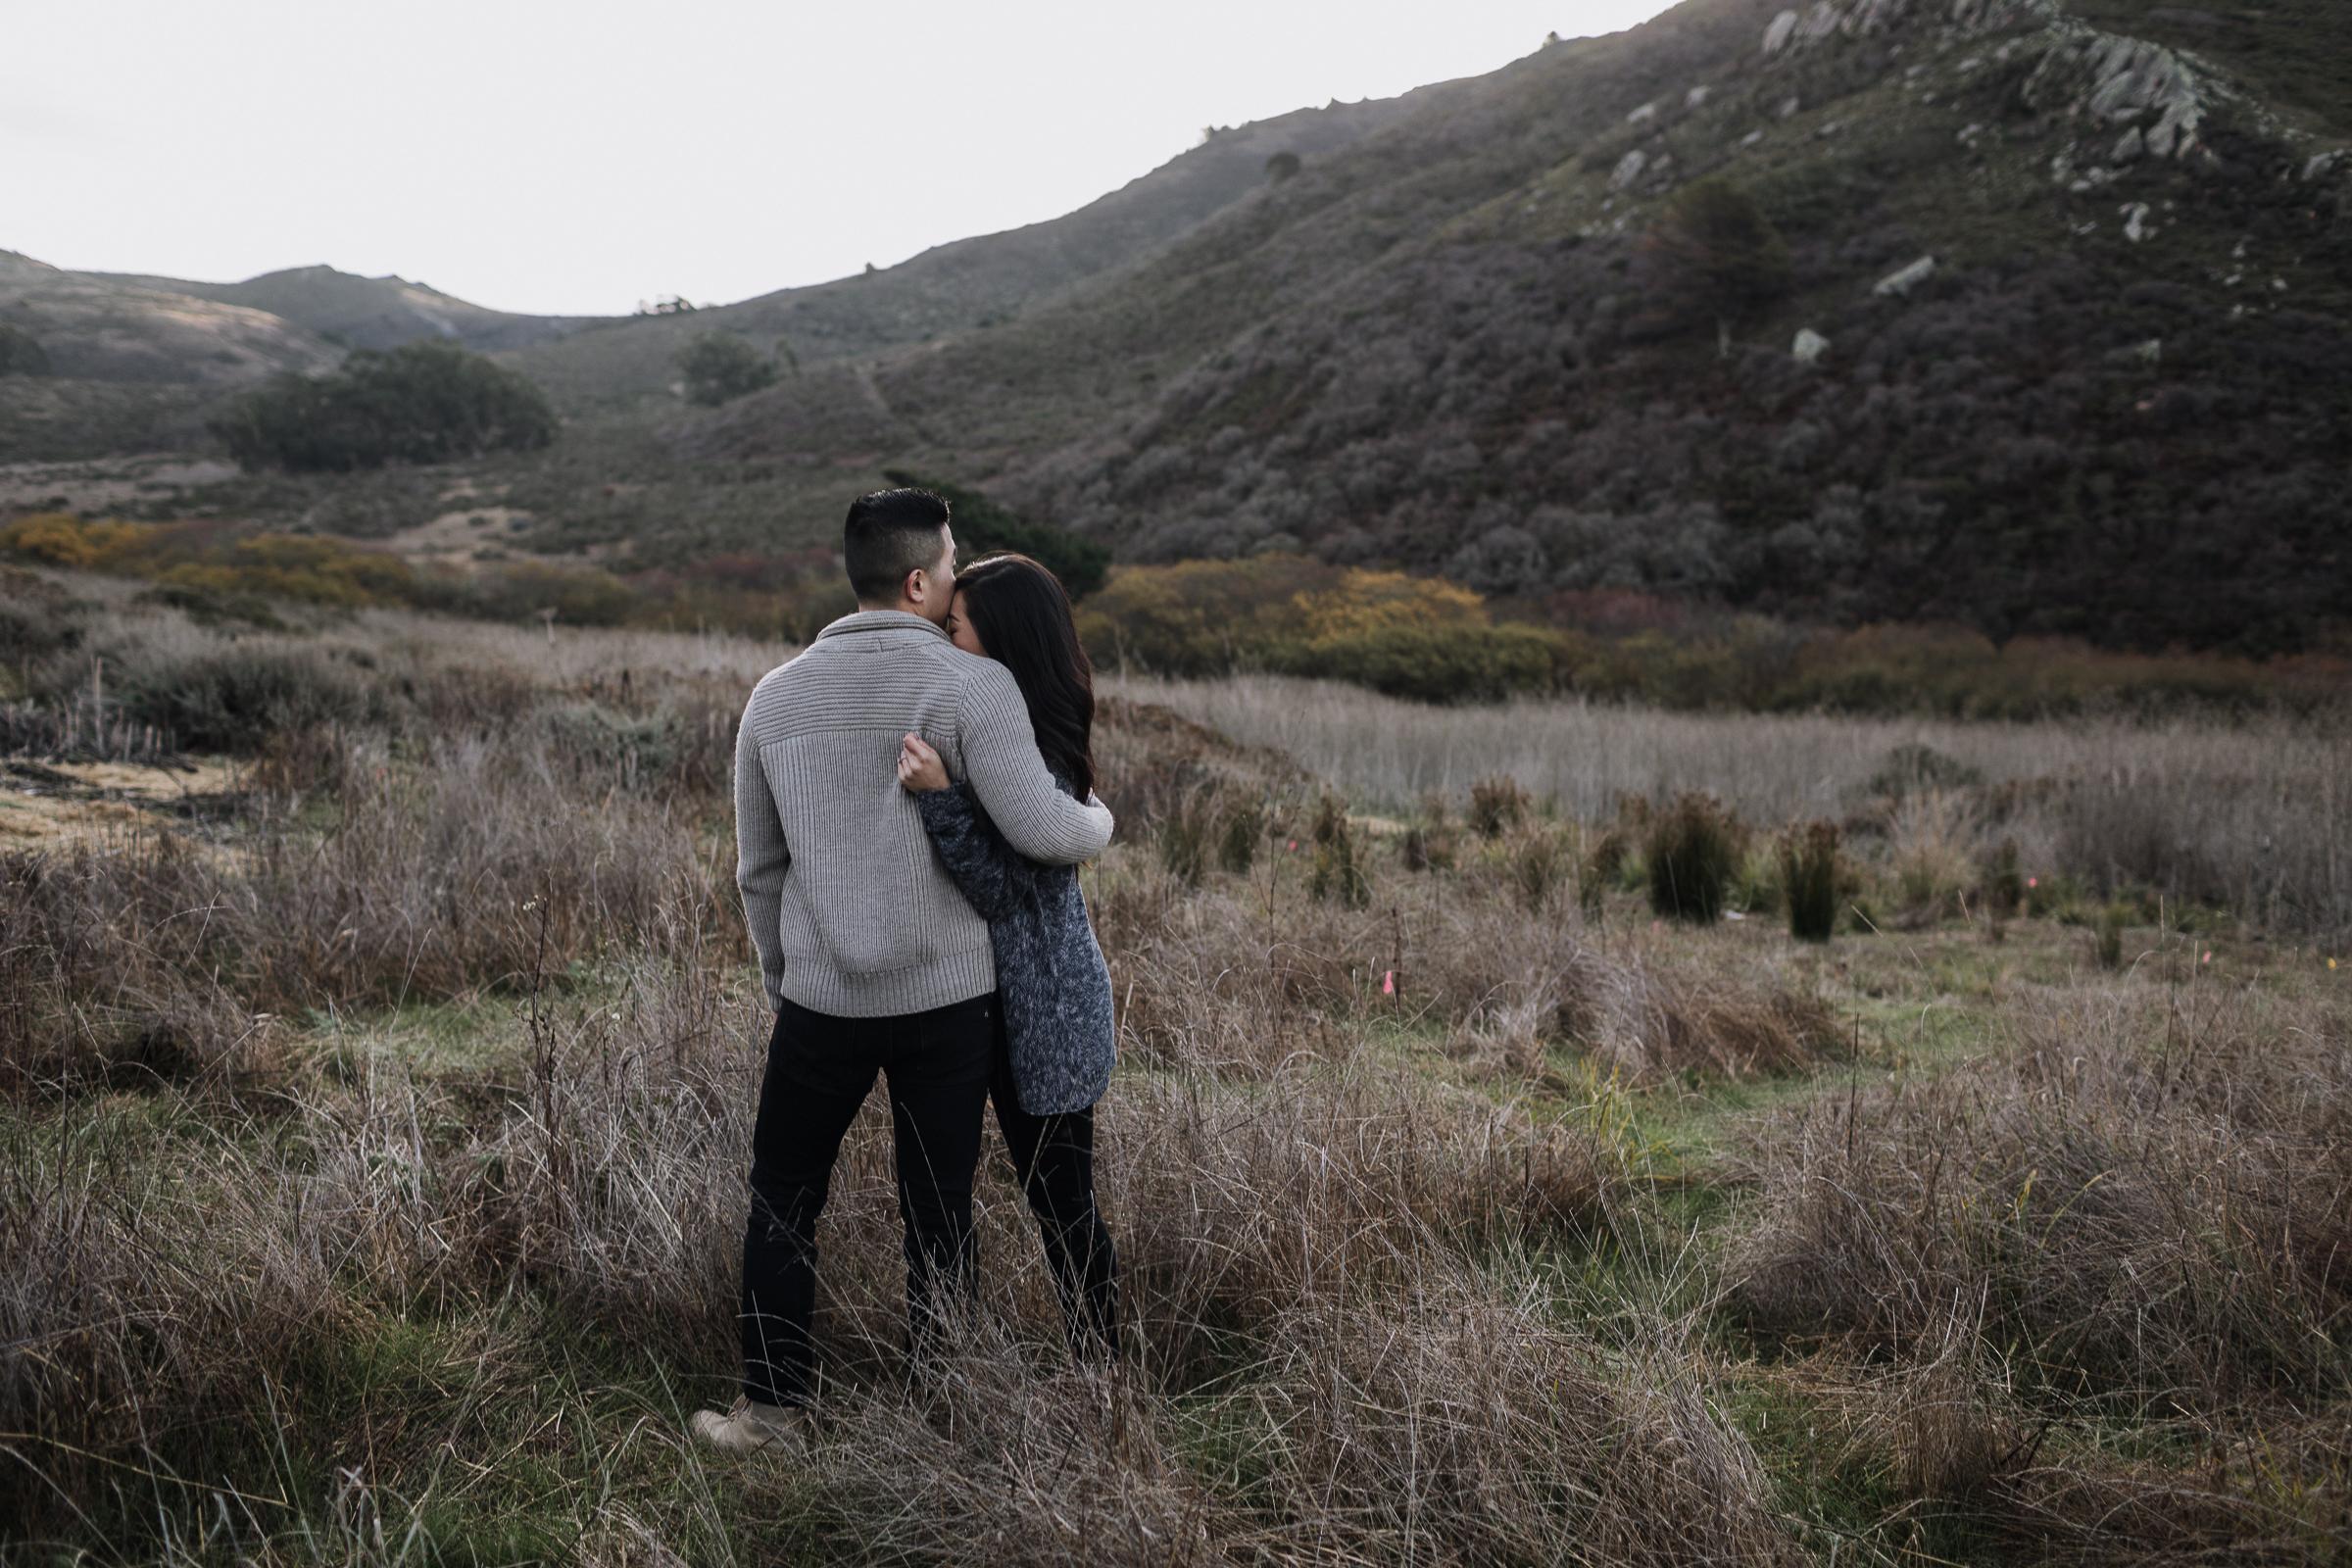 gretchen_gause_tennessee_valley_trail_engagement_photo_california-29.jpg